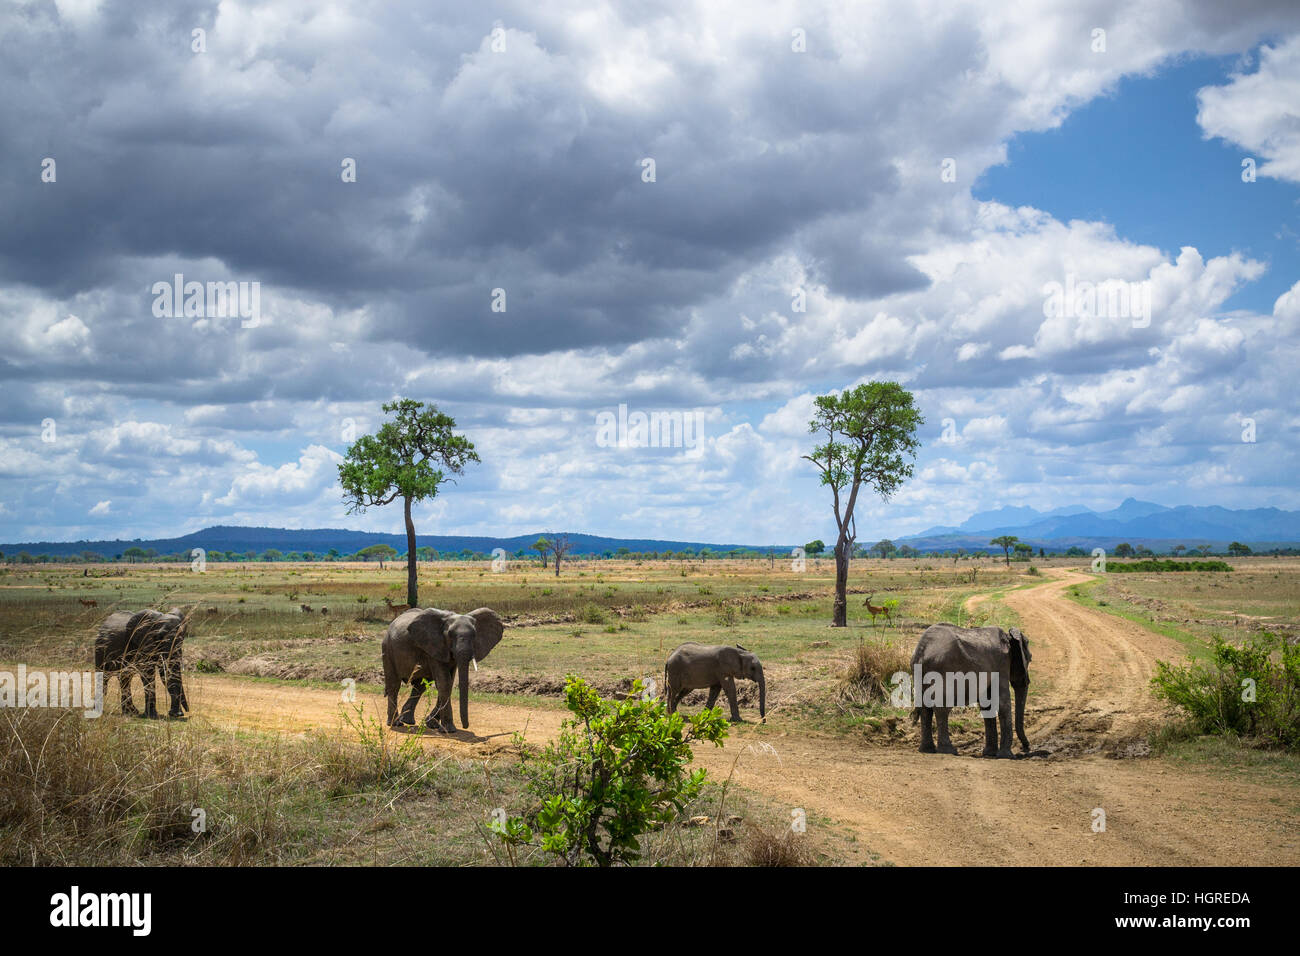 Wild elephants in Africa, Ruaha - Stock Image